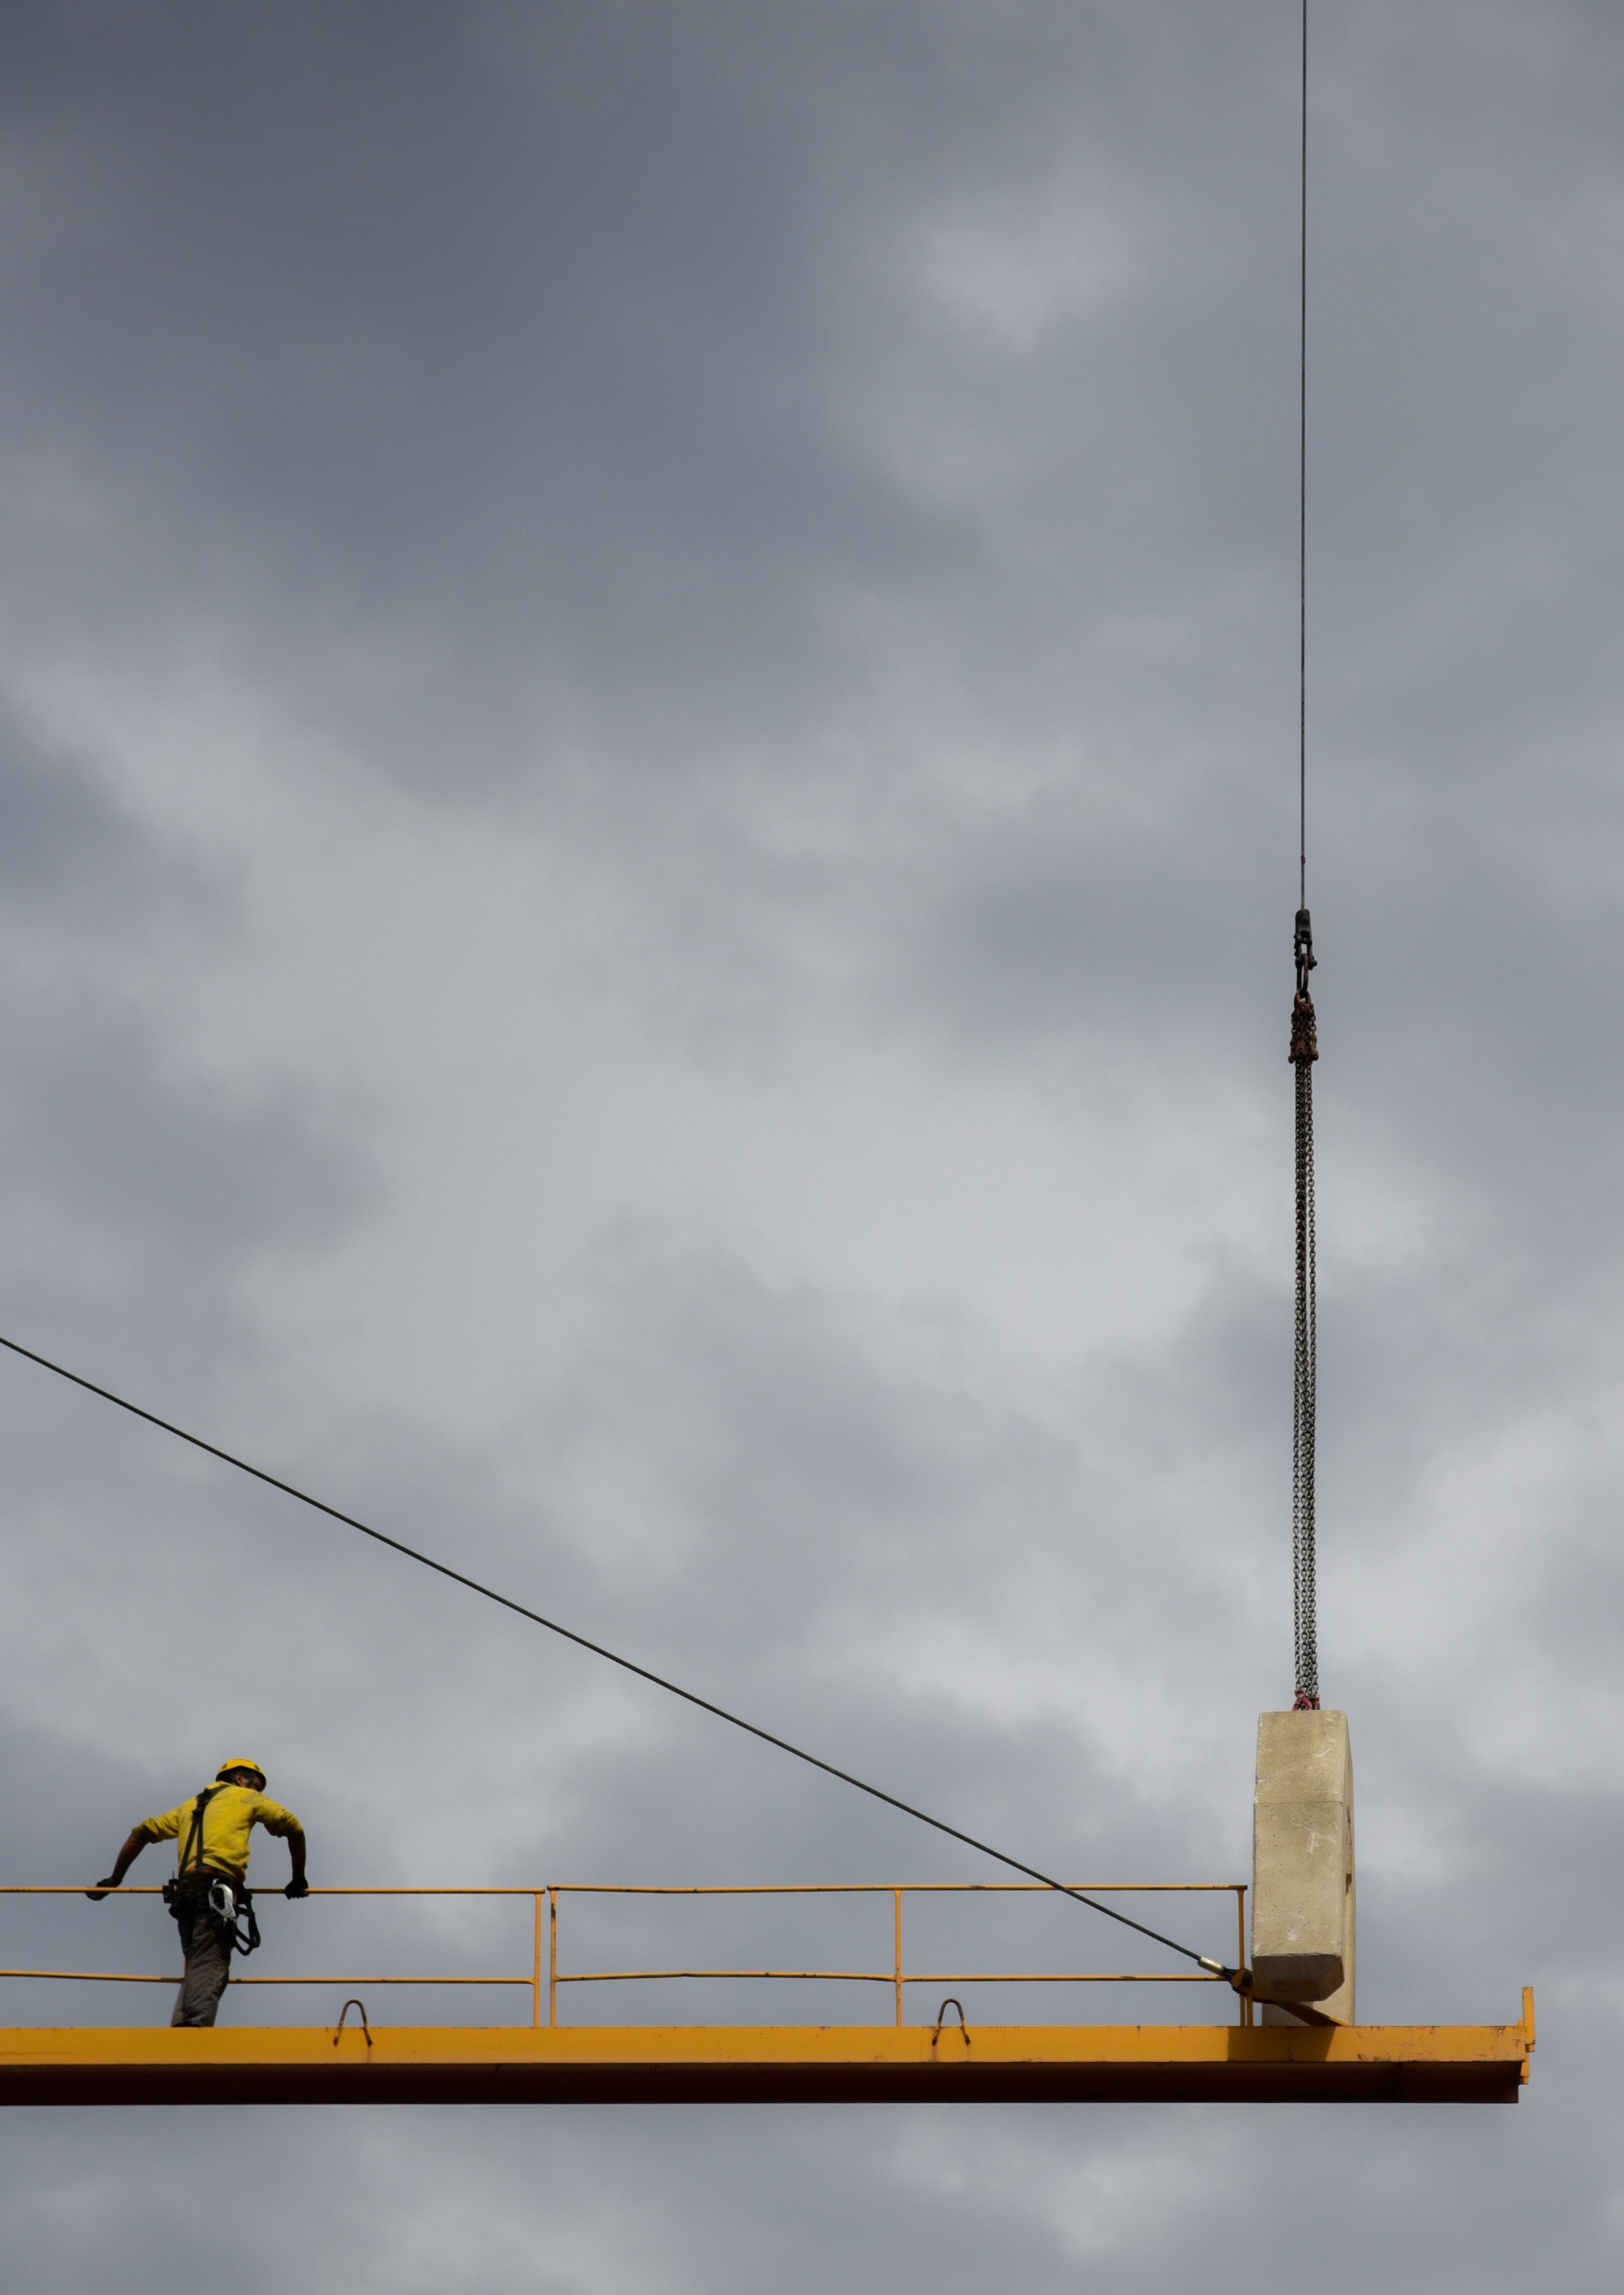 man wearing black harness strap holding yellow metal platform railing under blue cloudy skies at daytime